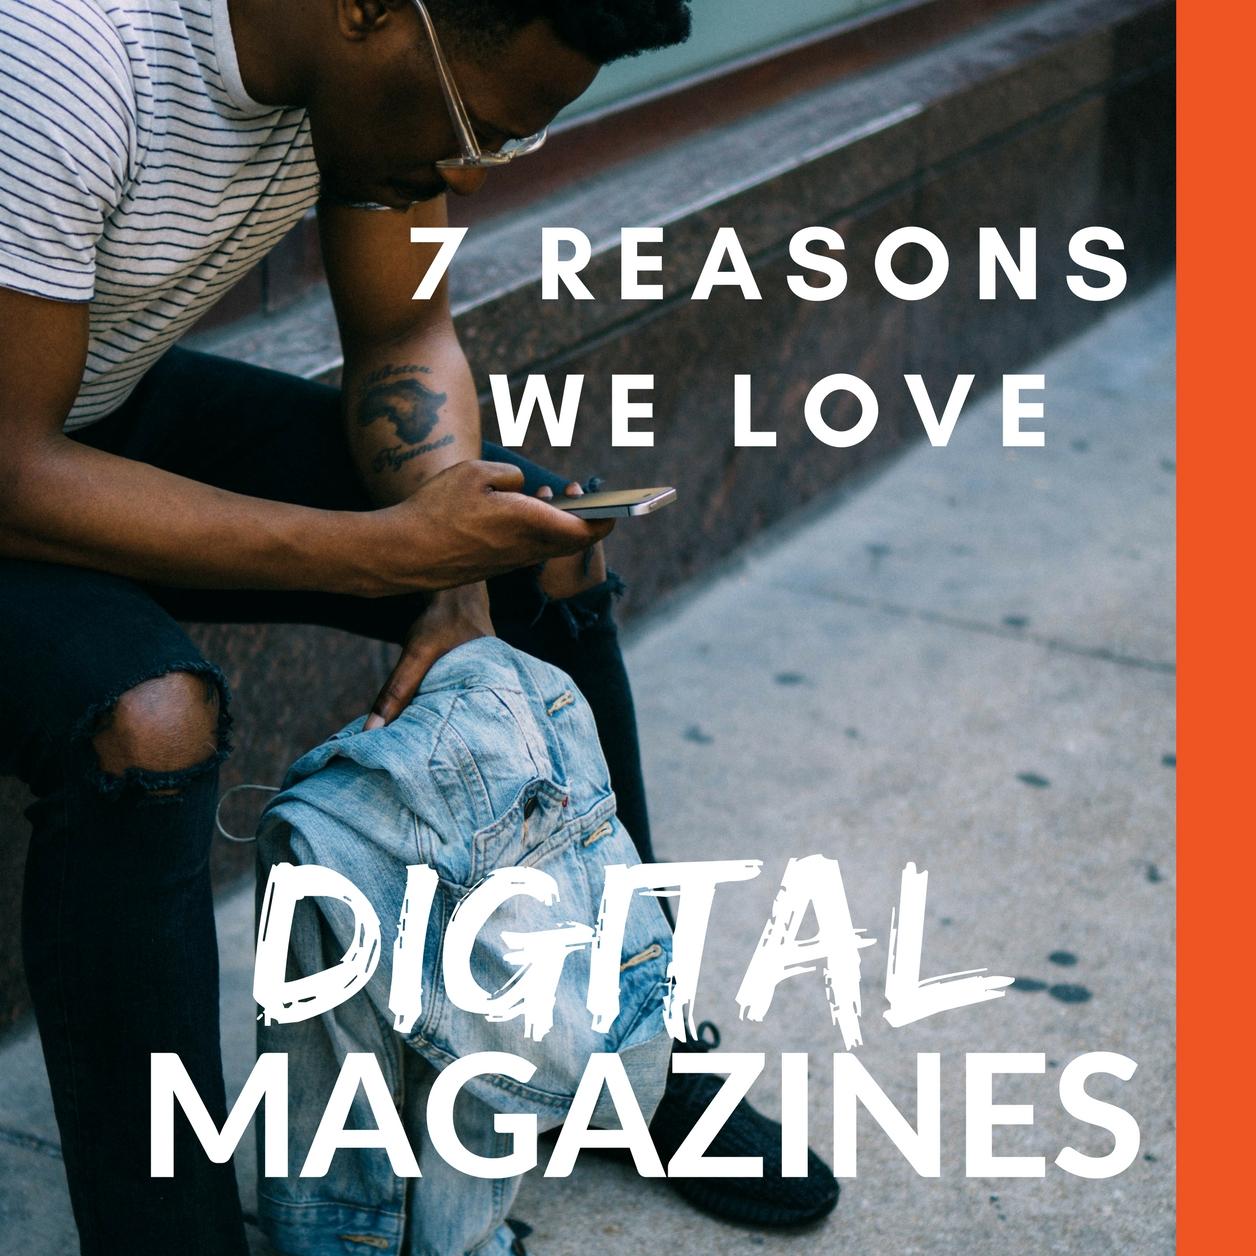 7 reasons we love digital magazines